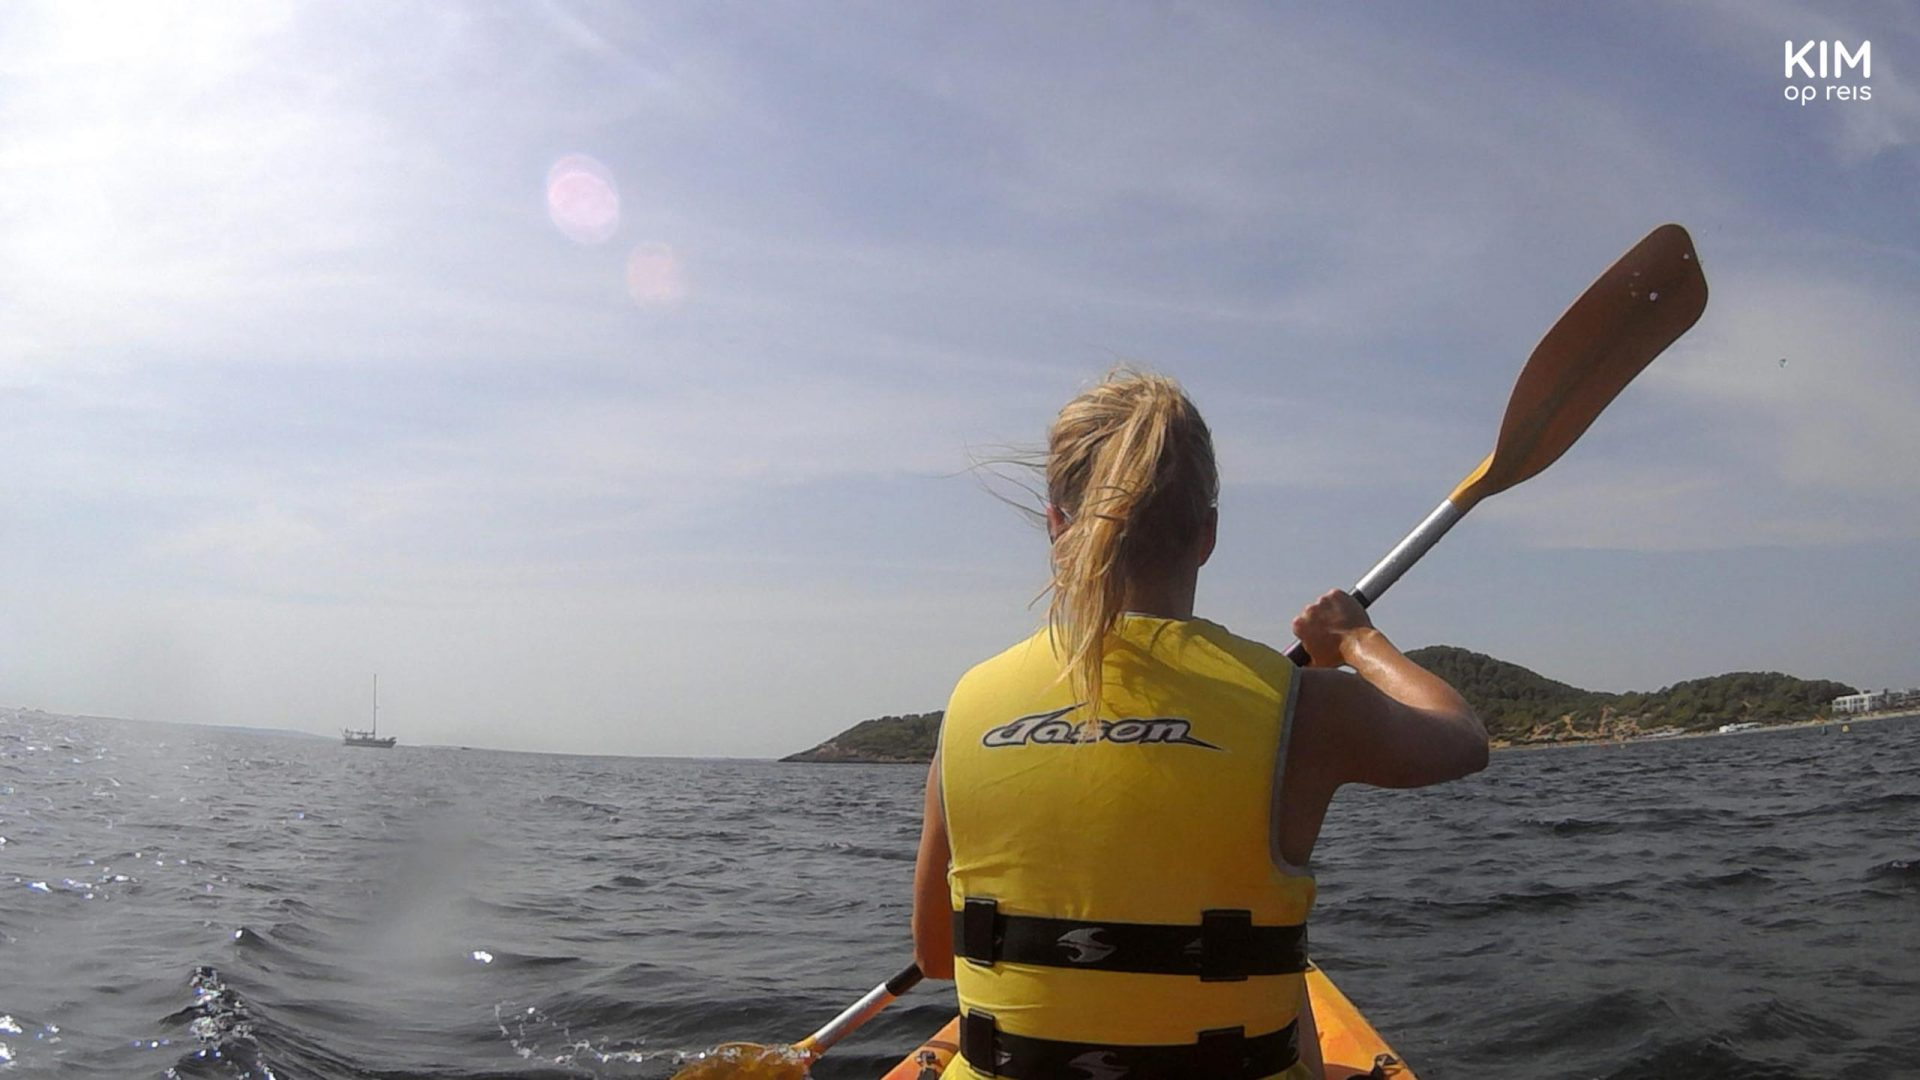 Kayak Ibiza Anfibios - Kim in the kayak, seen from her back